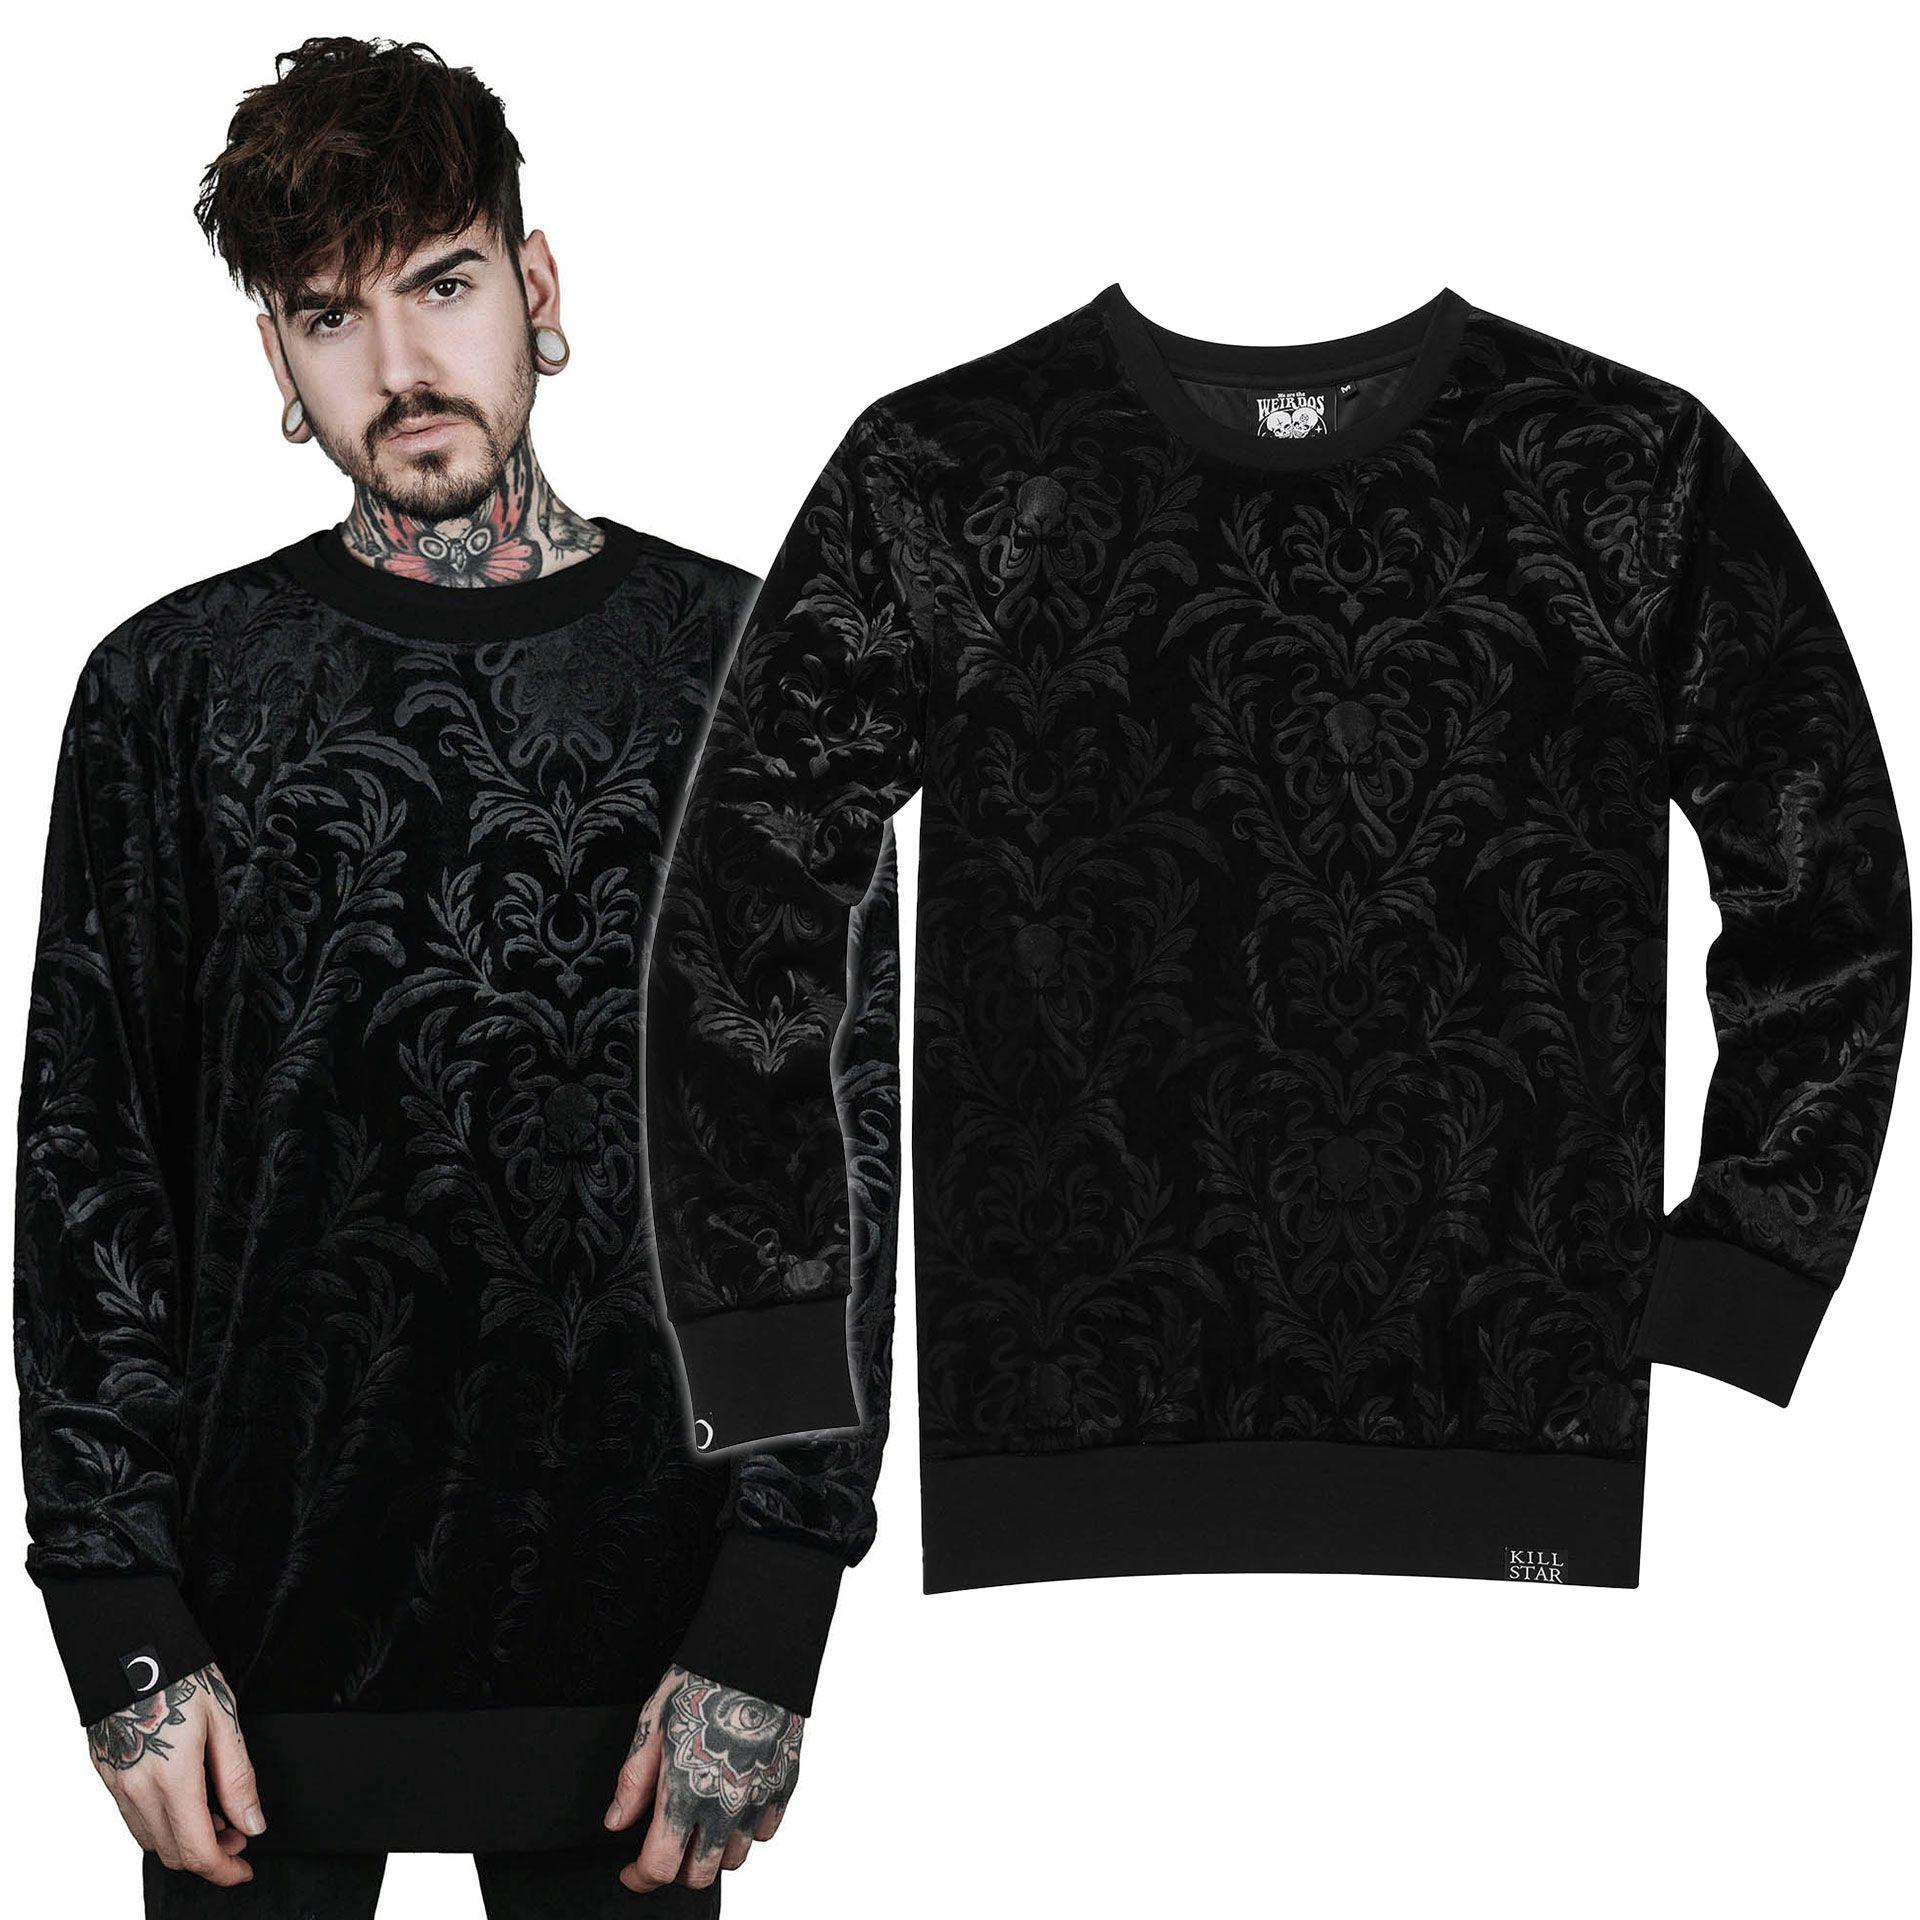 Cthulhu Velvet Sweatshirt